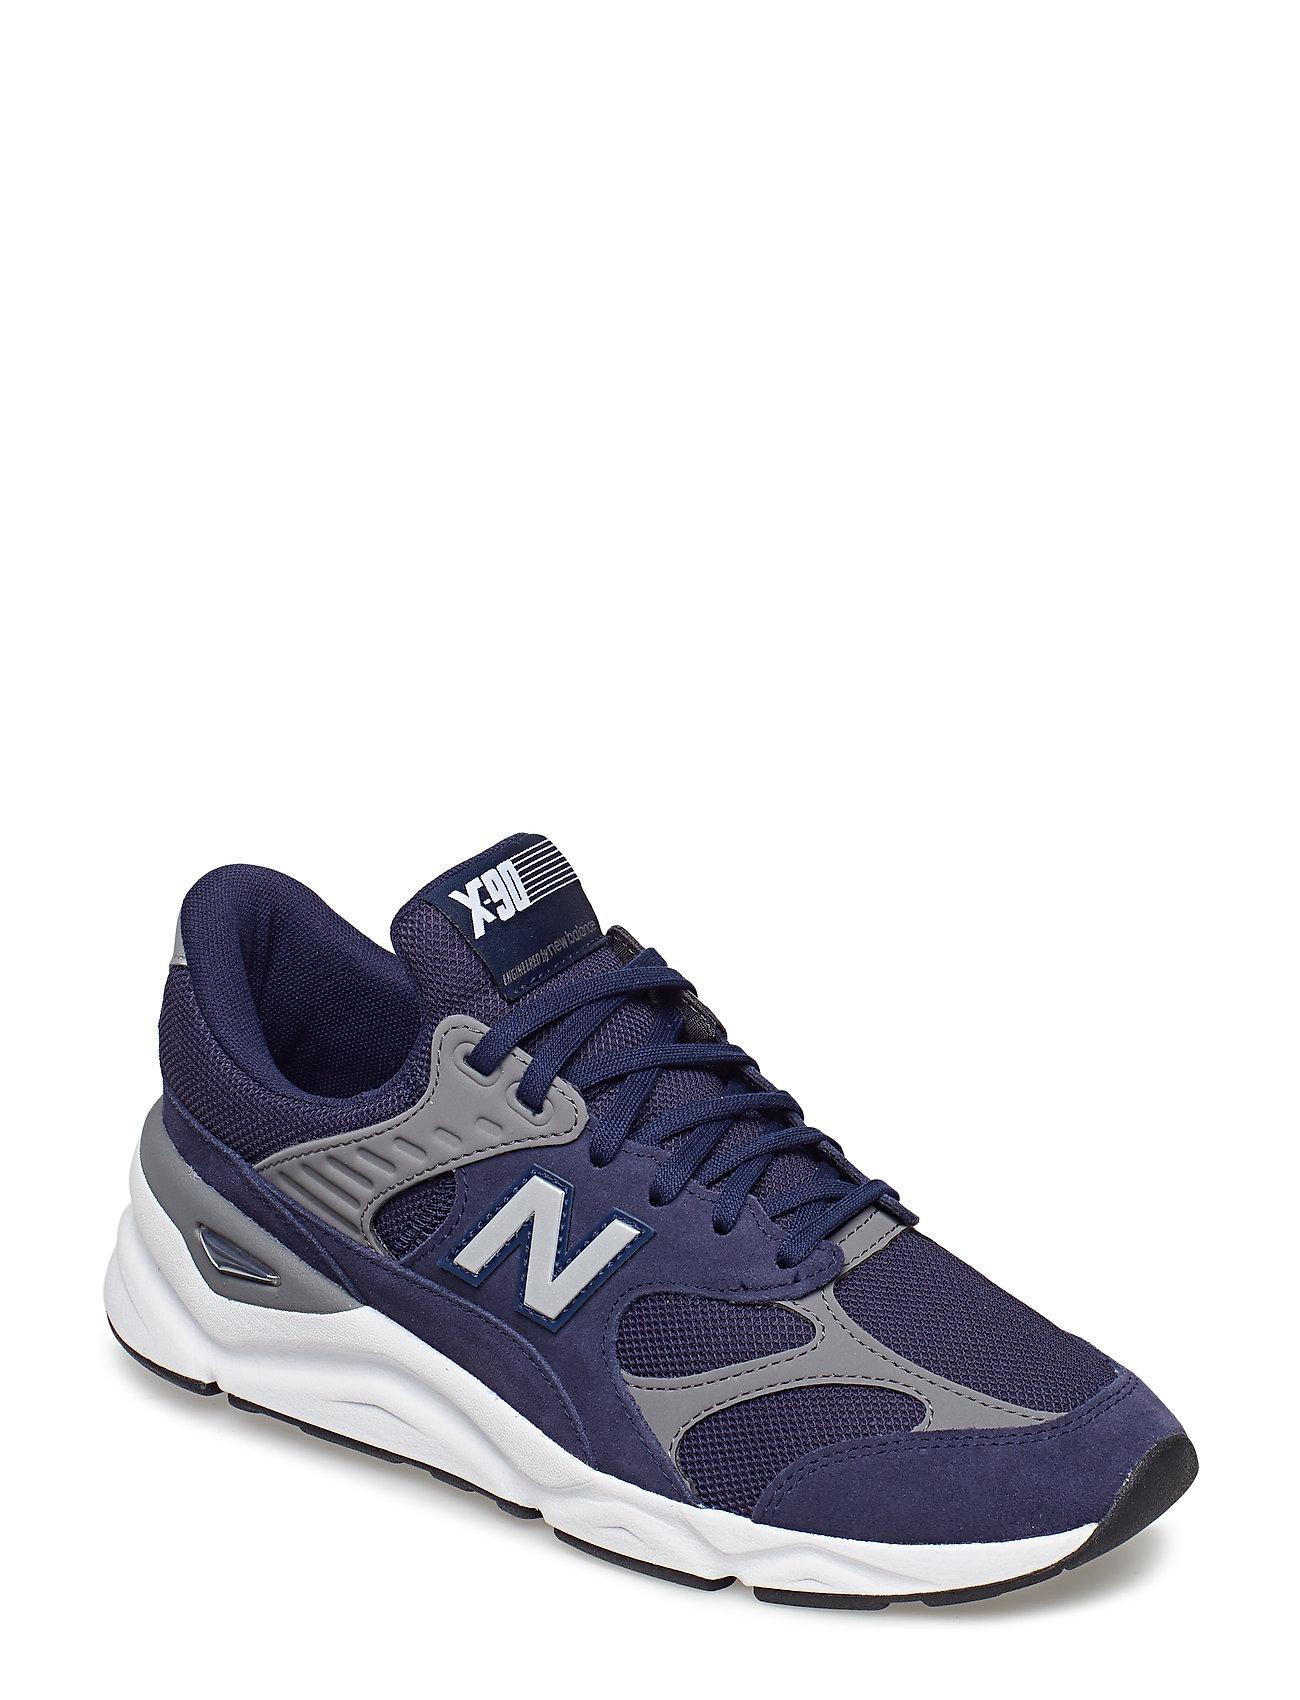 NEW BALANCE Msx90 Niedrige Sneaker Blau NEW BALANCE